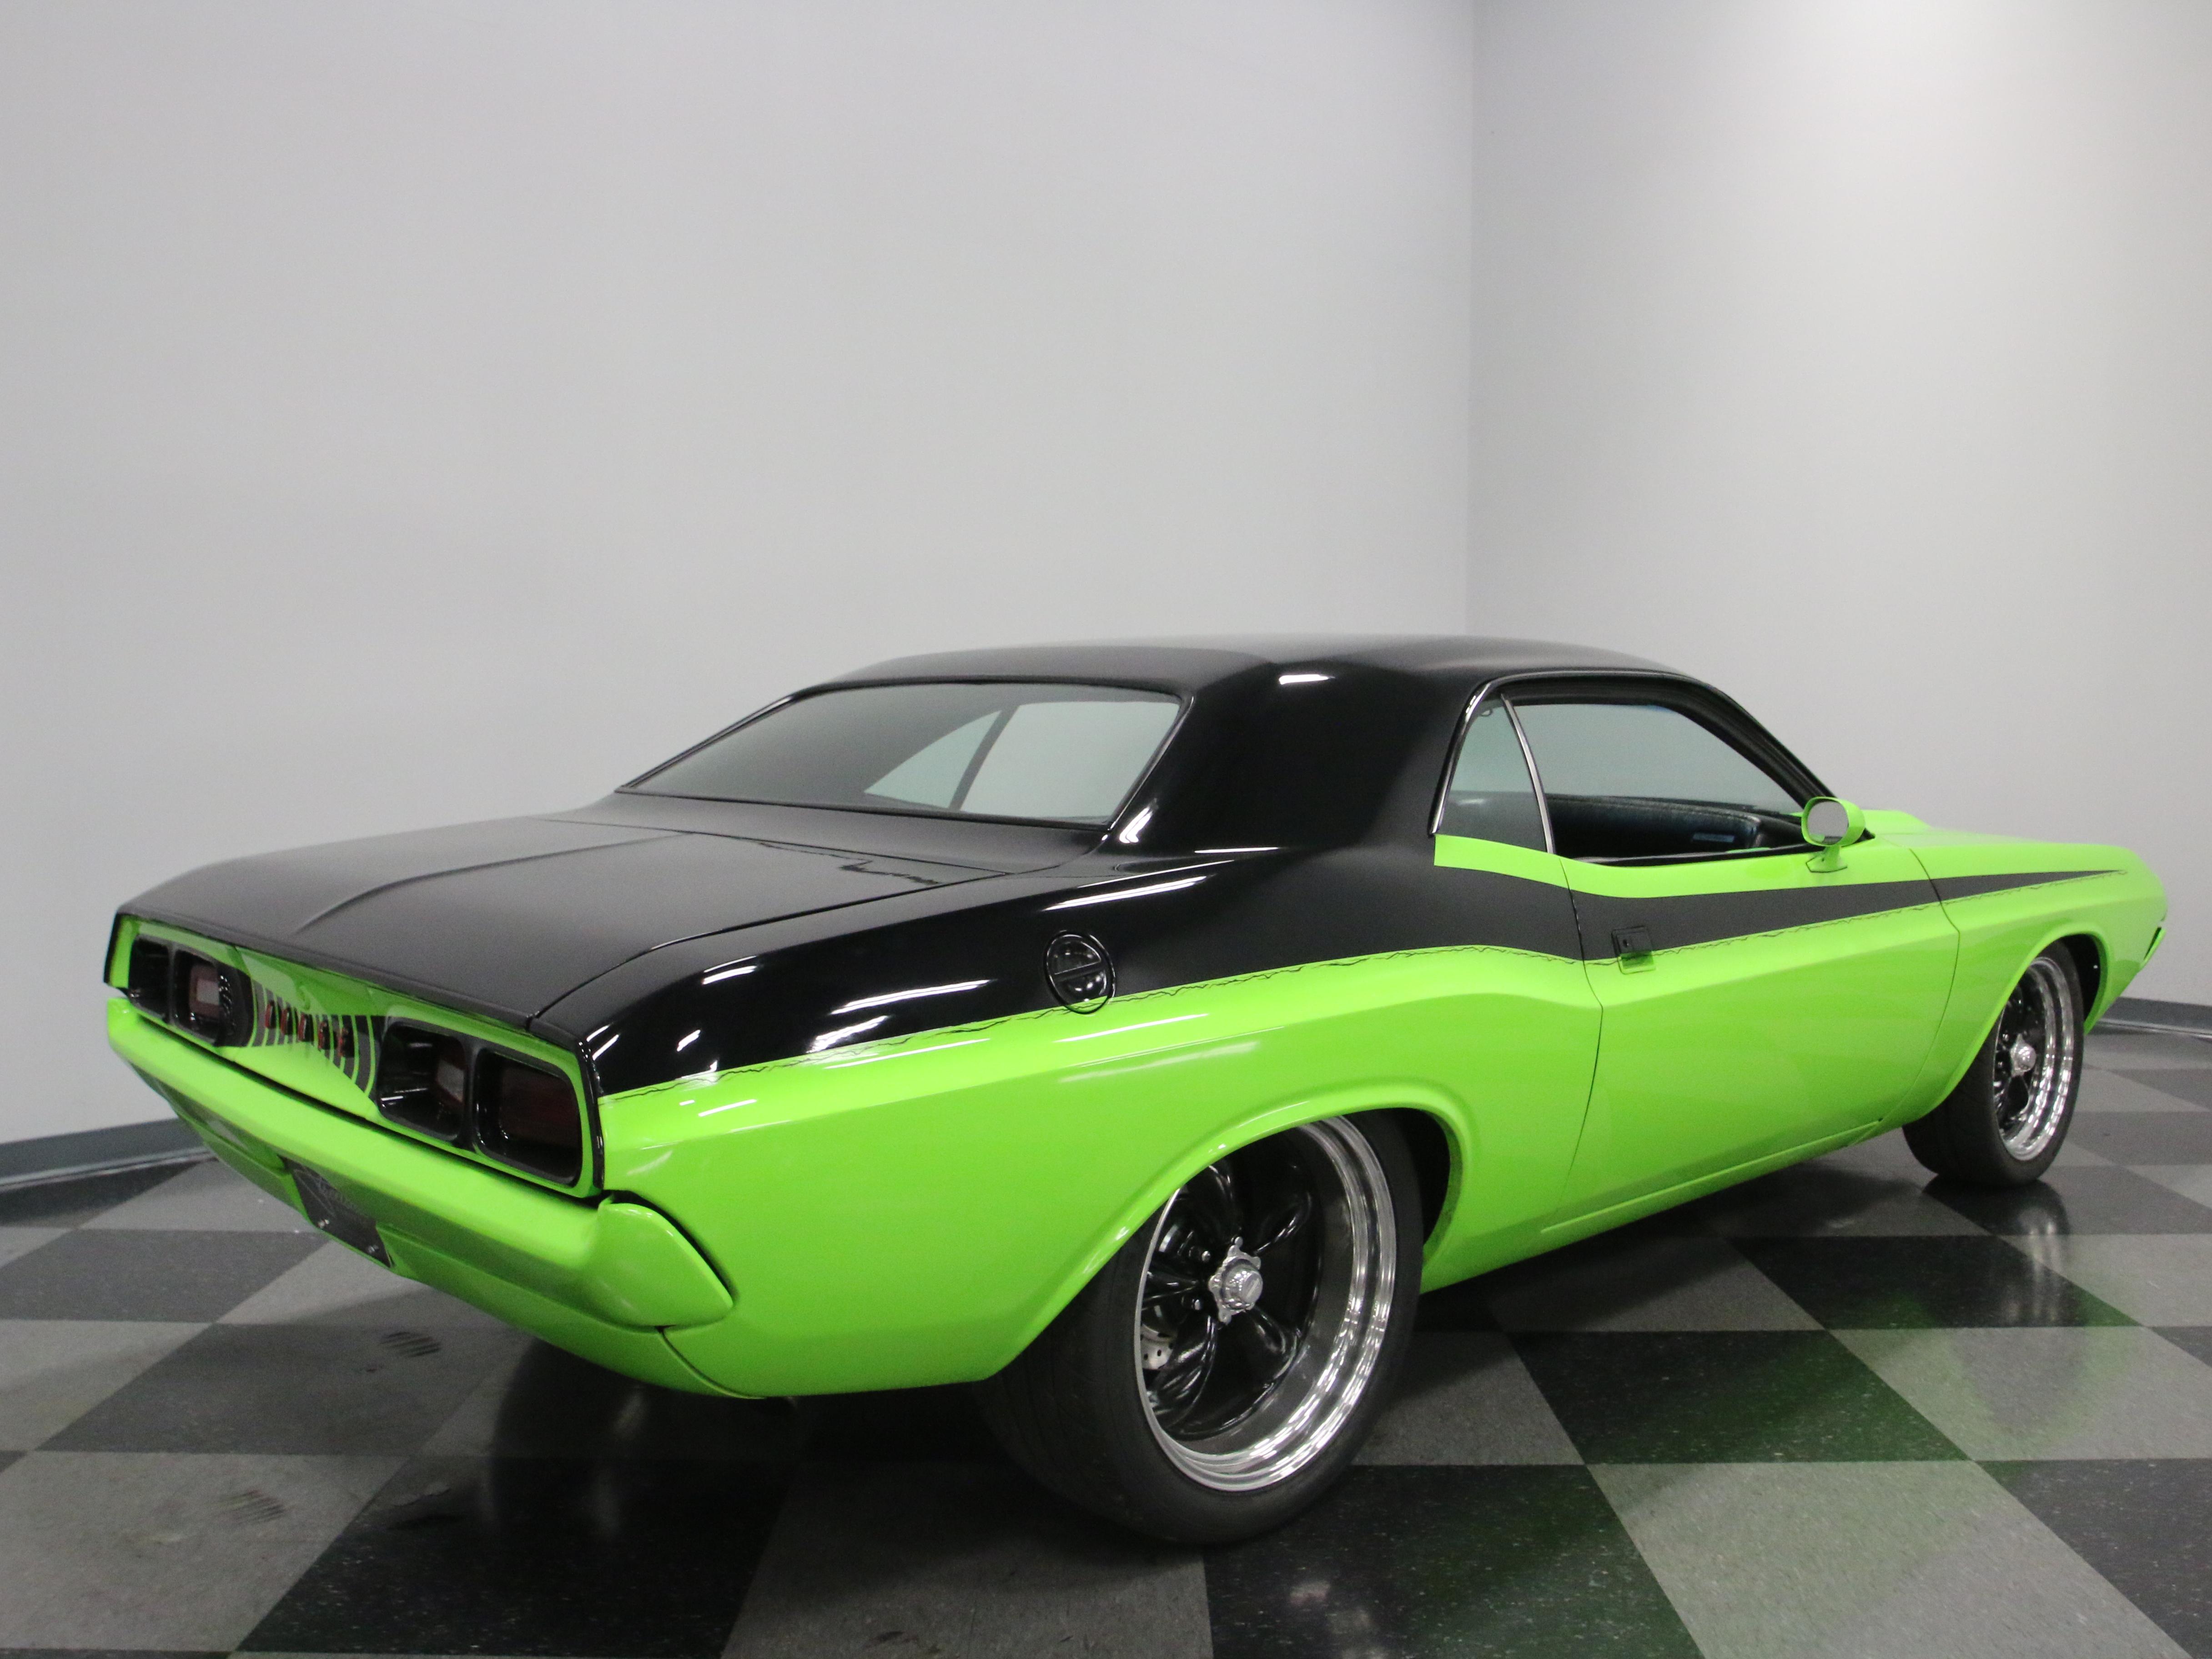 0722-NSH | 1973 Dodge Challenger Restomod | Streetside Classics